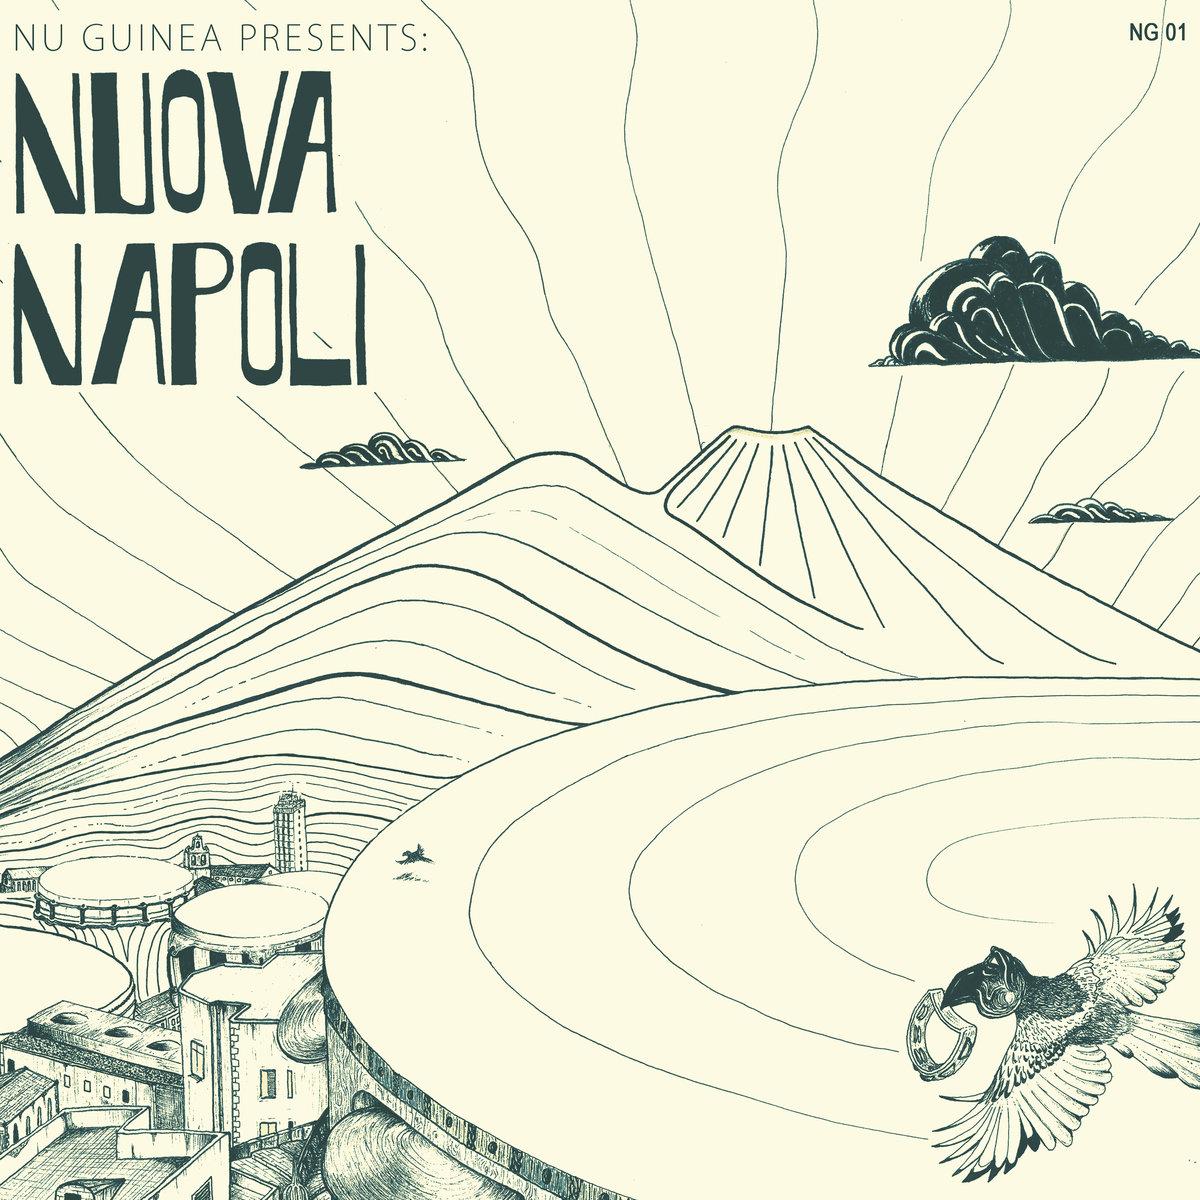 Nu Guinea - Nuova Napoli - Les Oreilles Curieuses